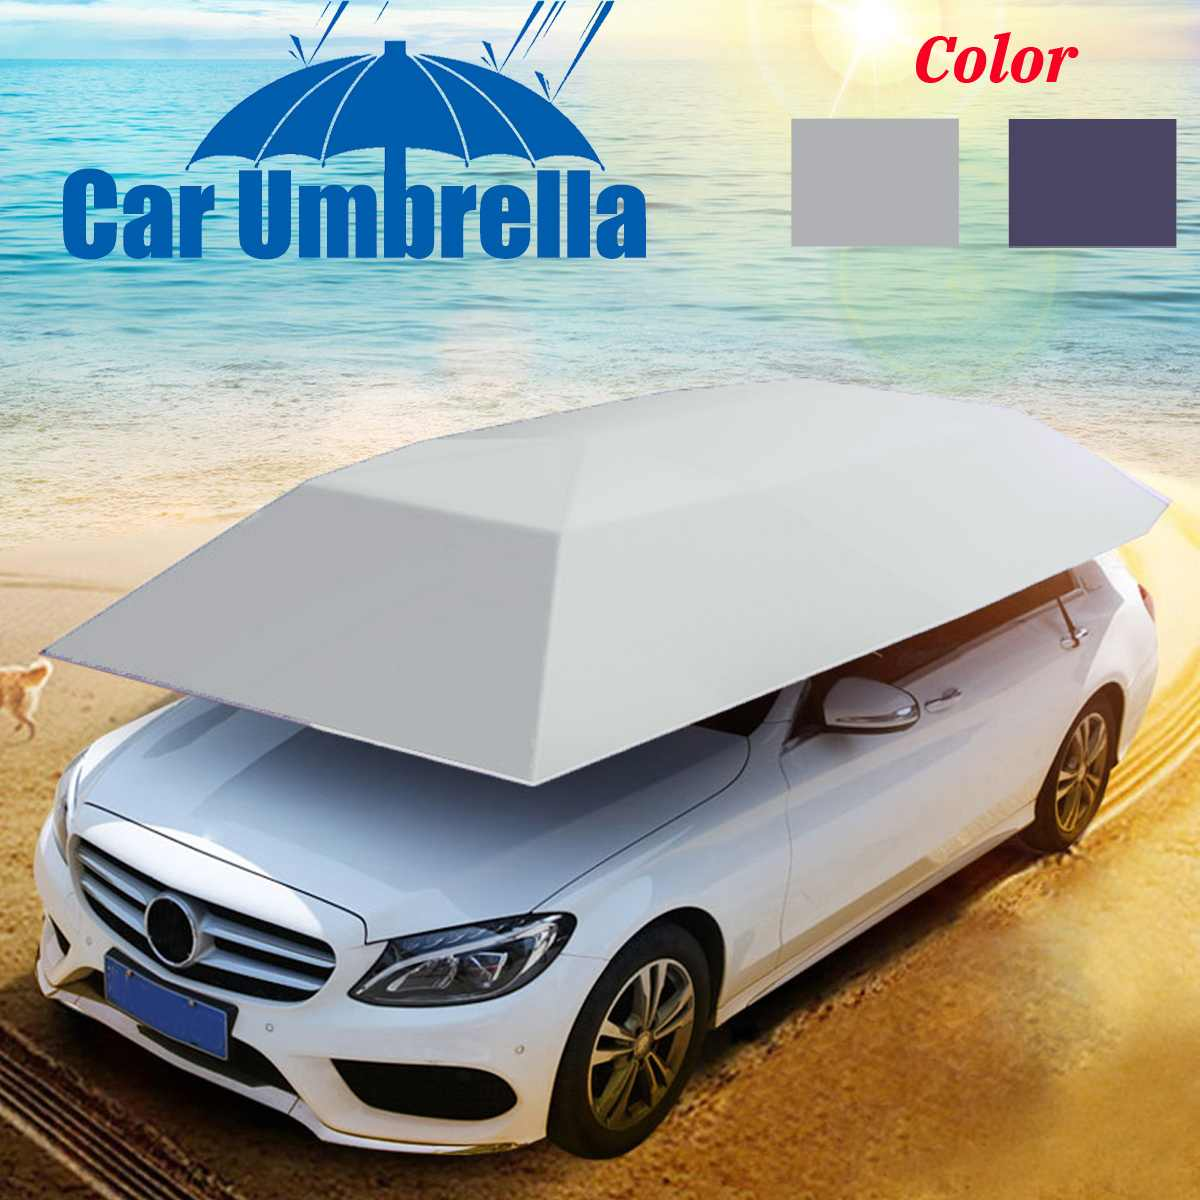 Outdoor Car Vehicle Tent Car/Picnic Umbrella Windproof Buttons Oxford Cloth Sun Shade Umbrella Auto Car Cover 4*2.1m(No Bracket)